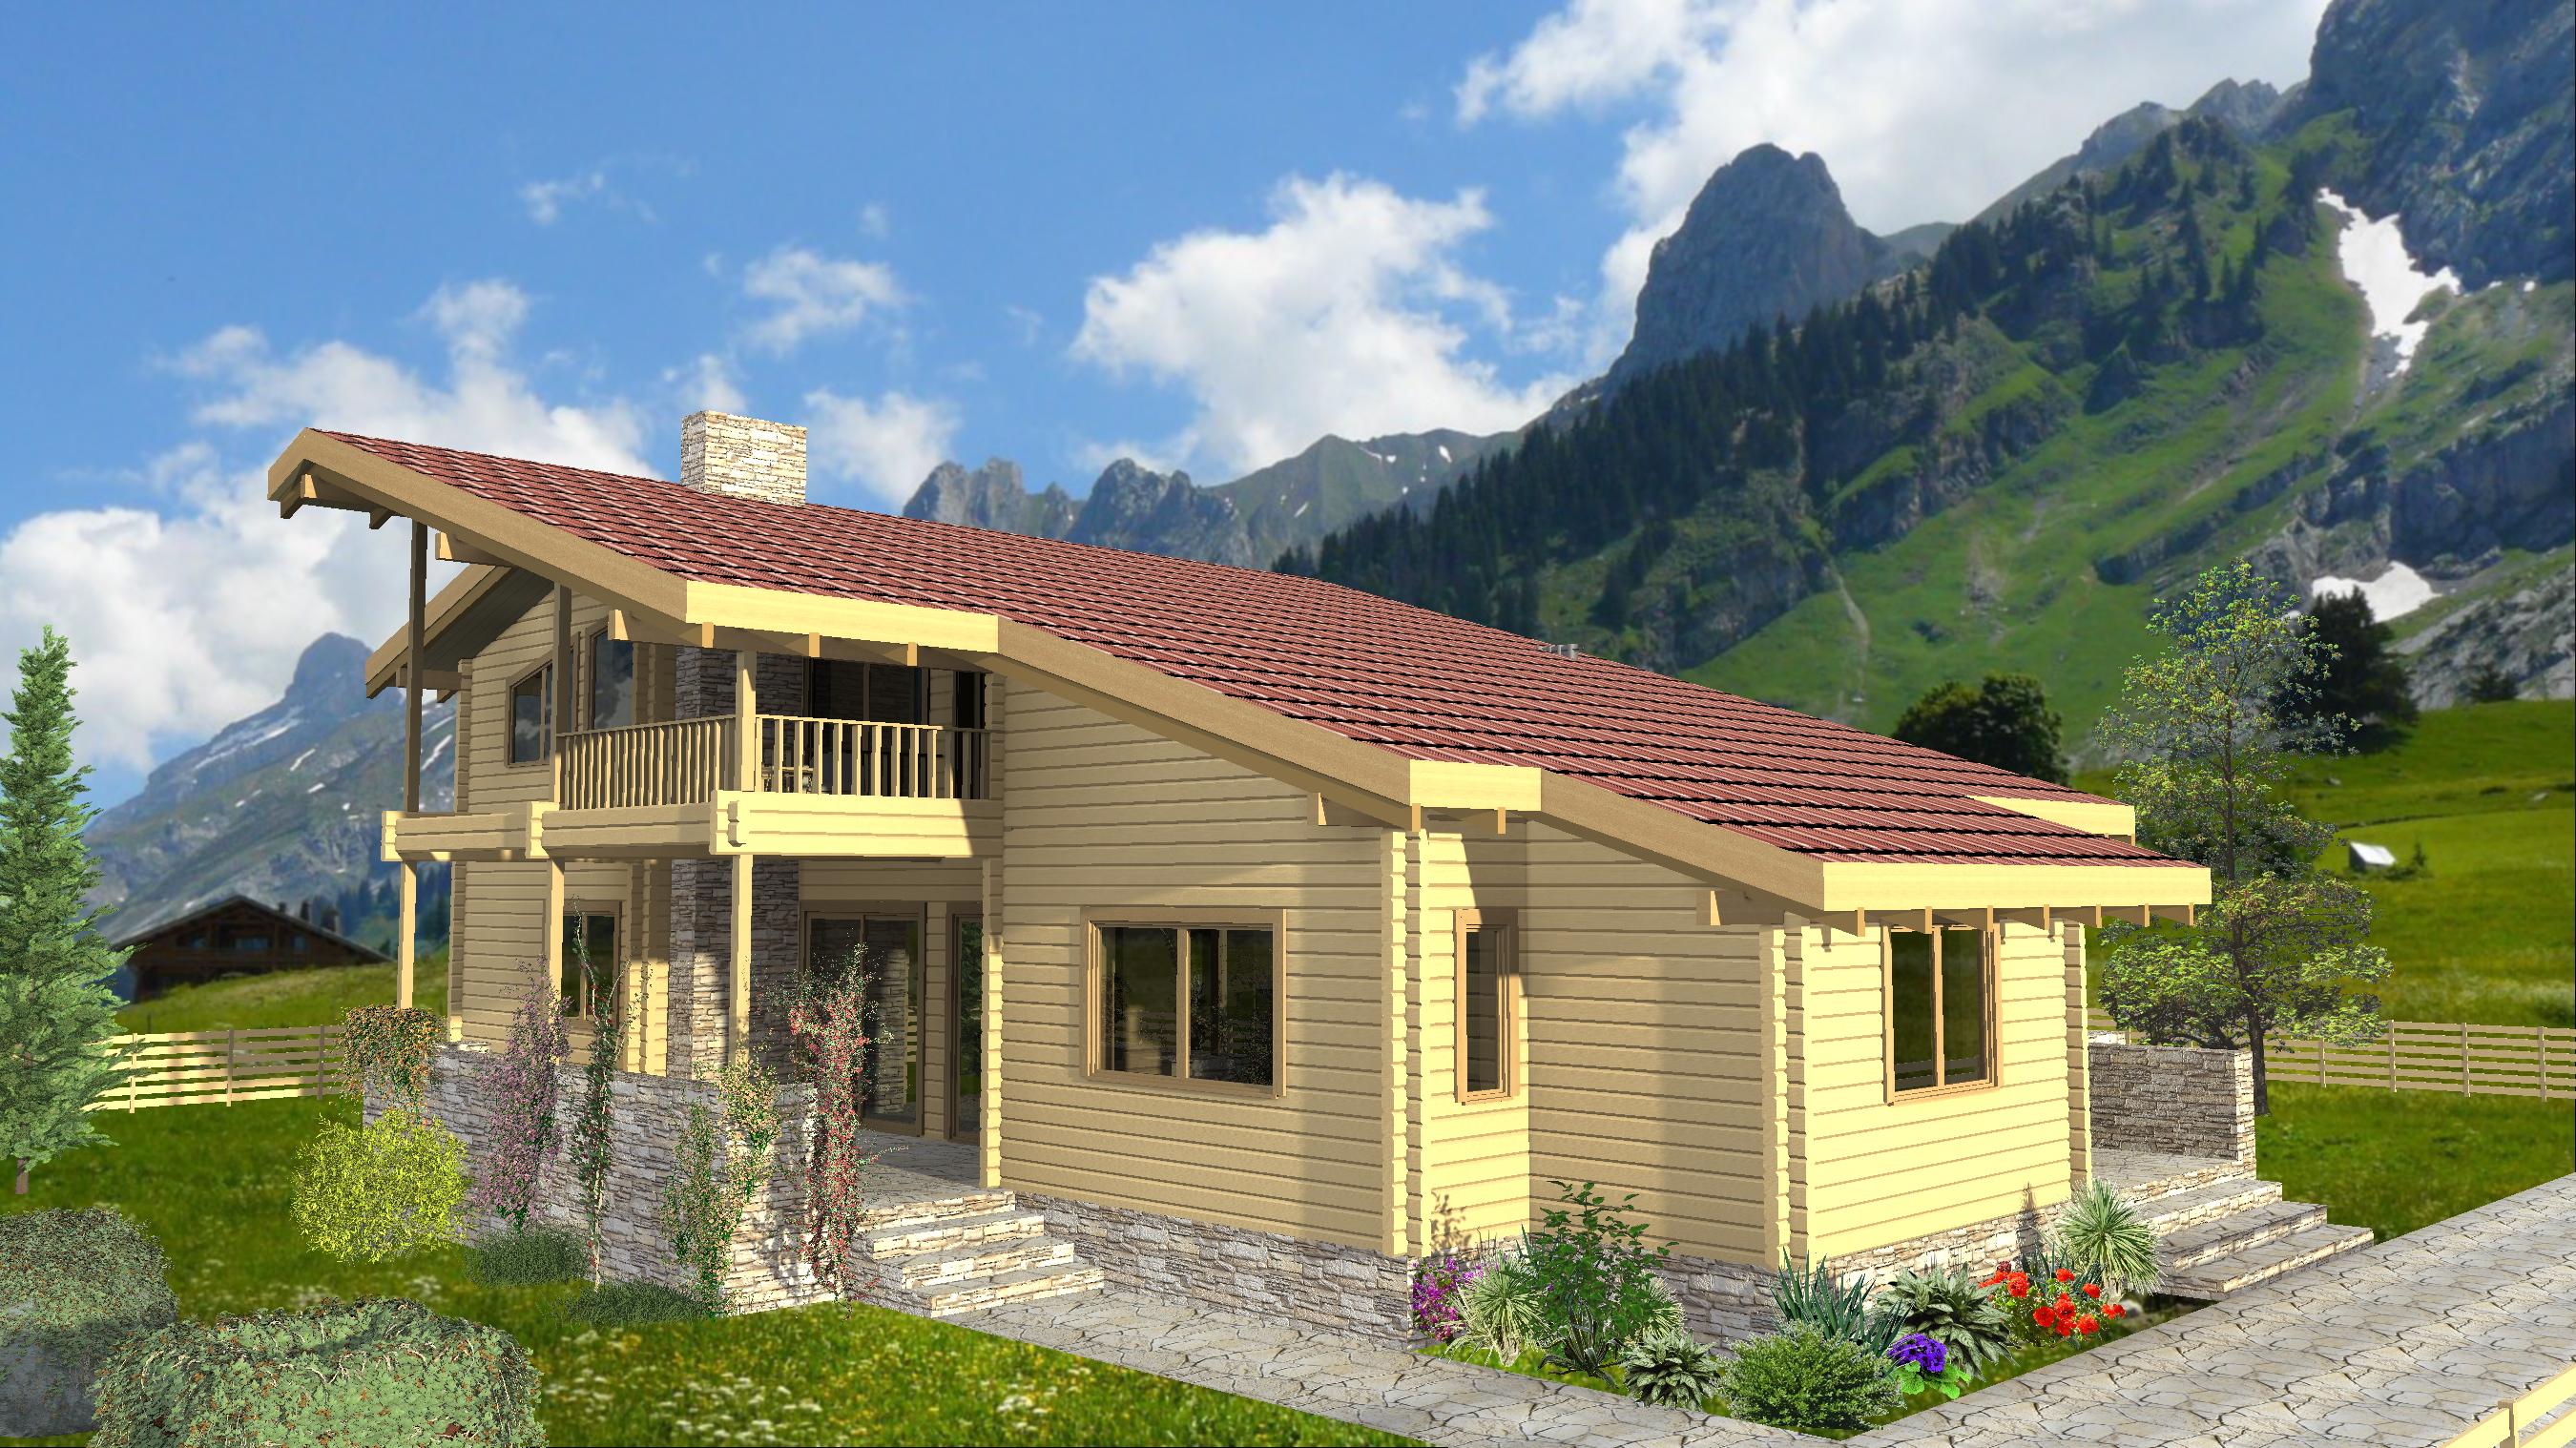 Lucrari de referinta casa din lemn belvedere euro for Foto case americane